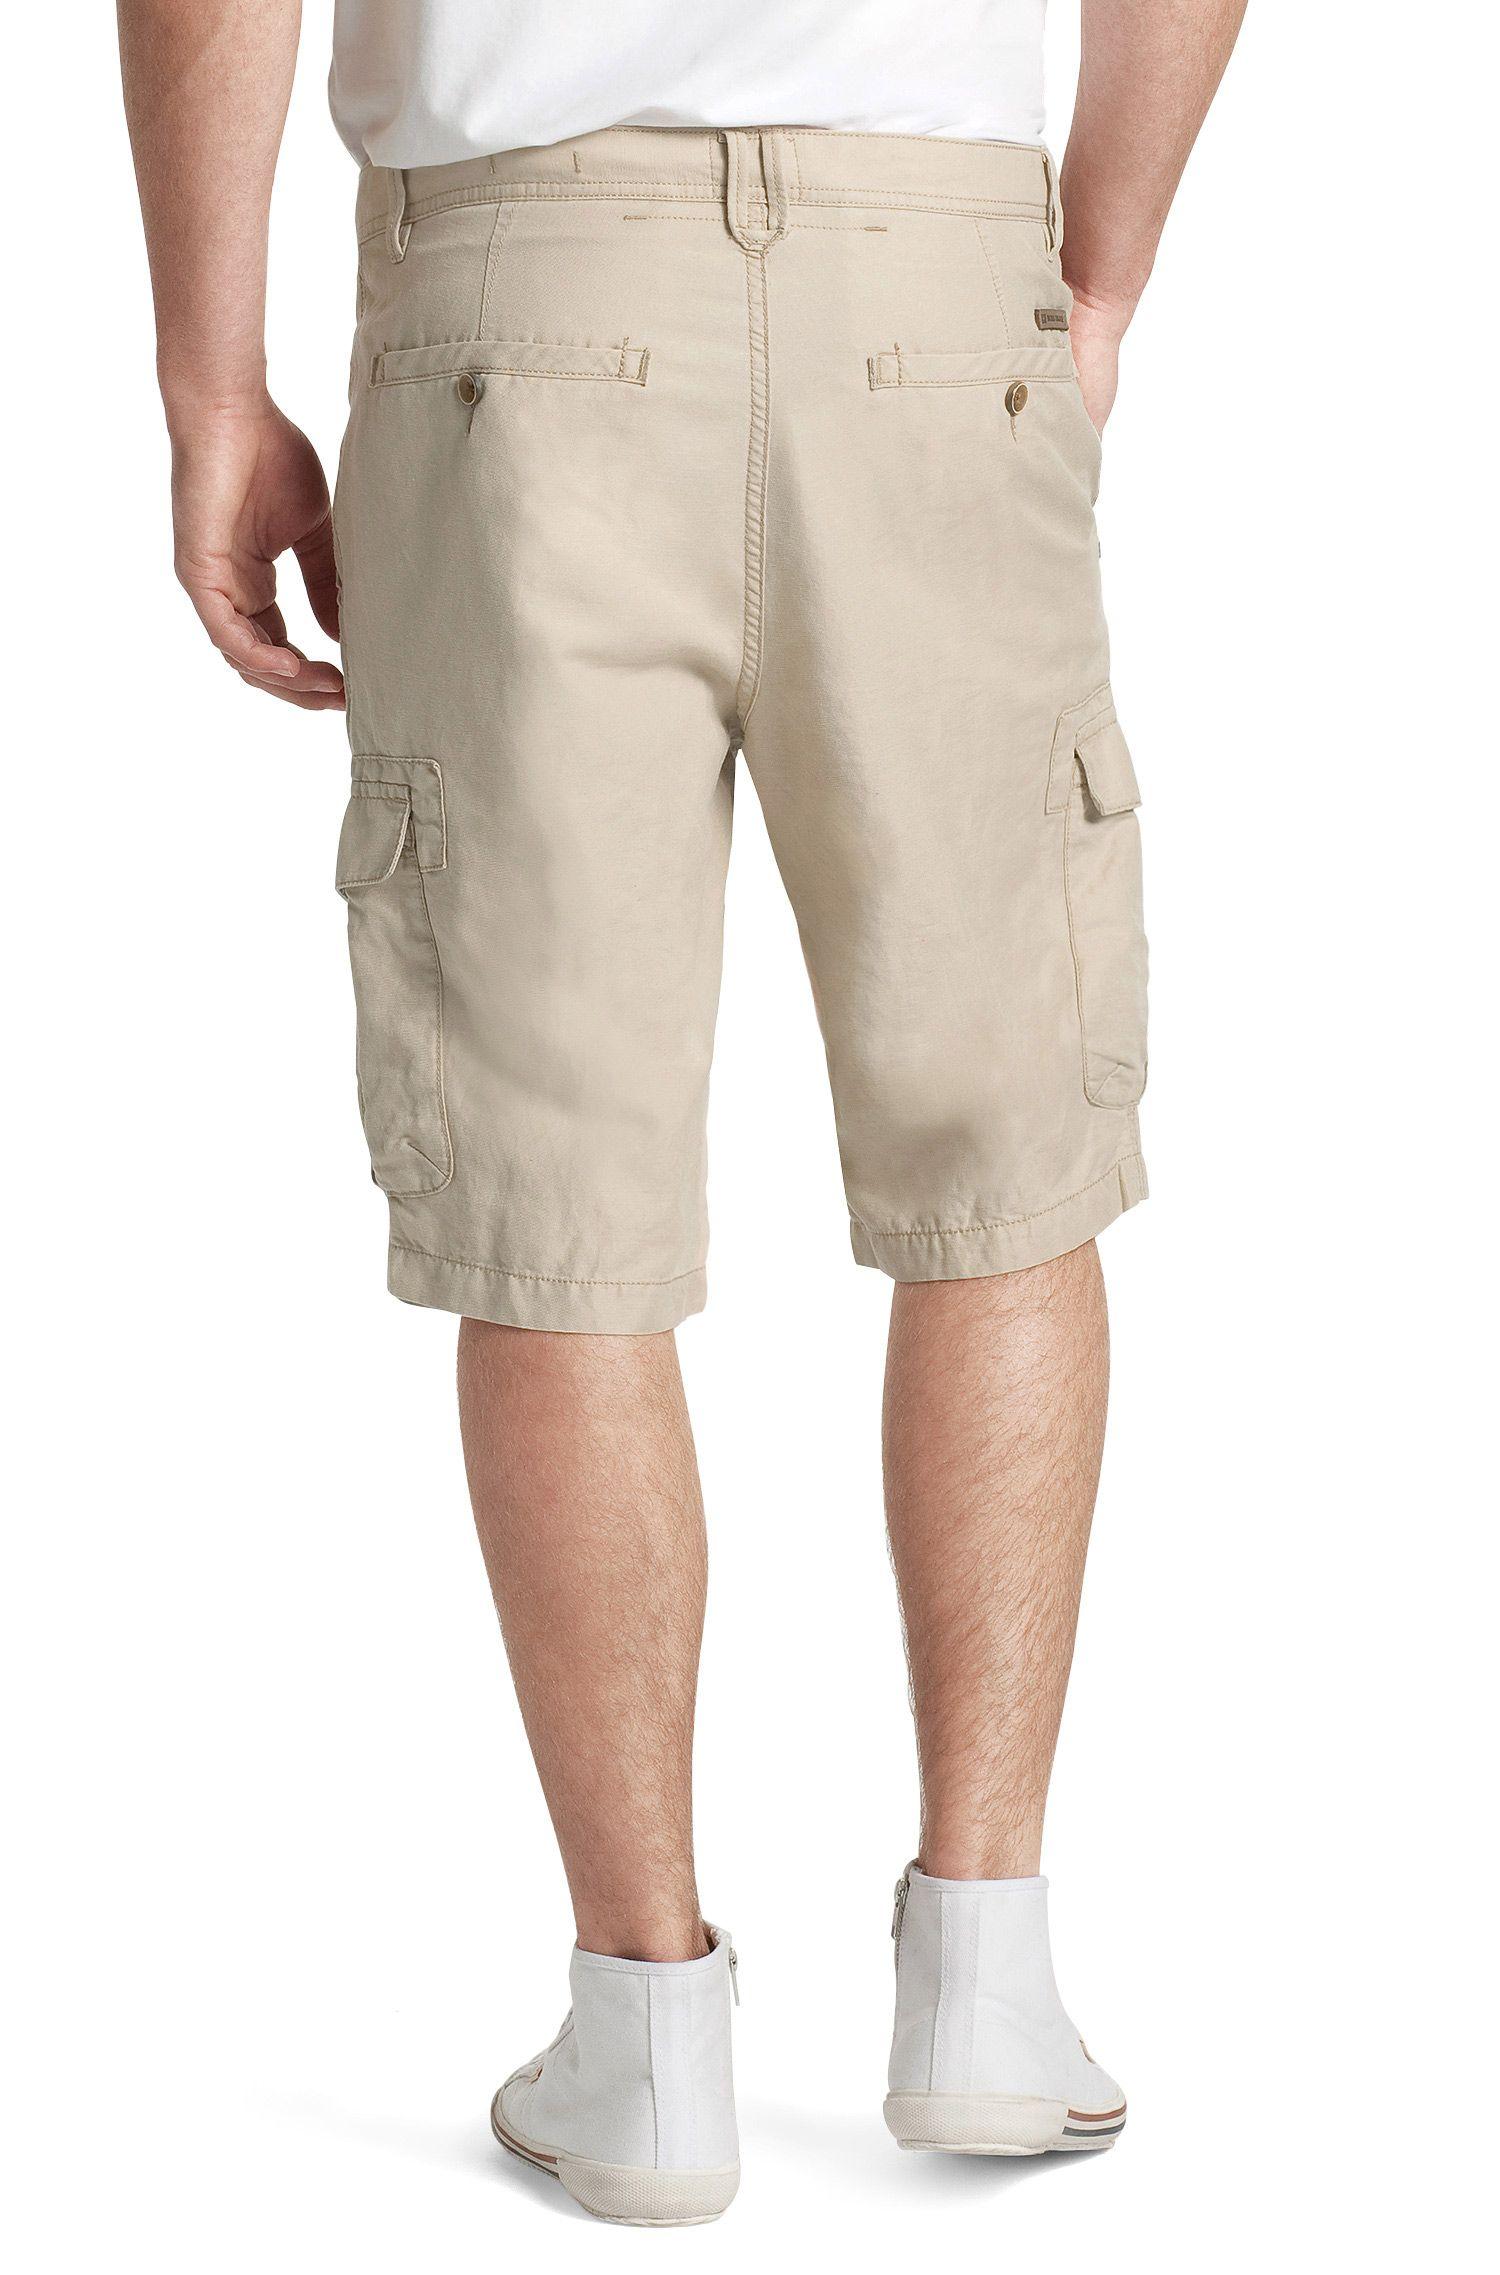 Shorts ´Strake-Shorts-D` aus Leinen-Mix